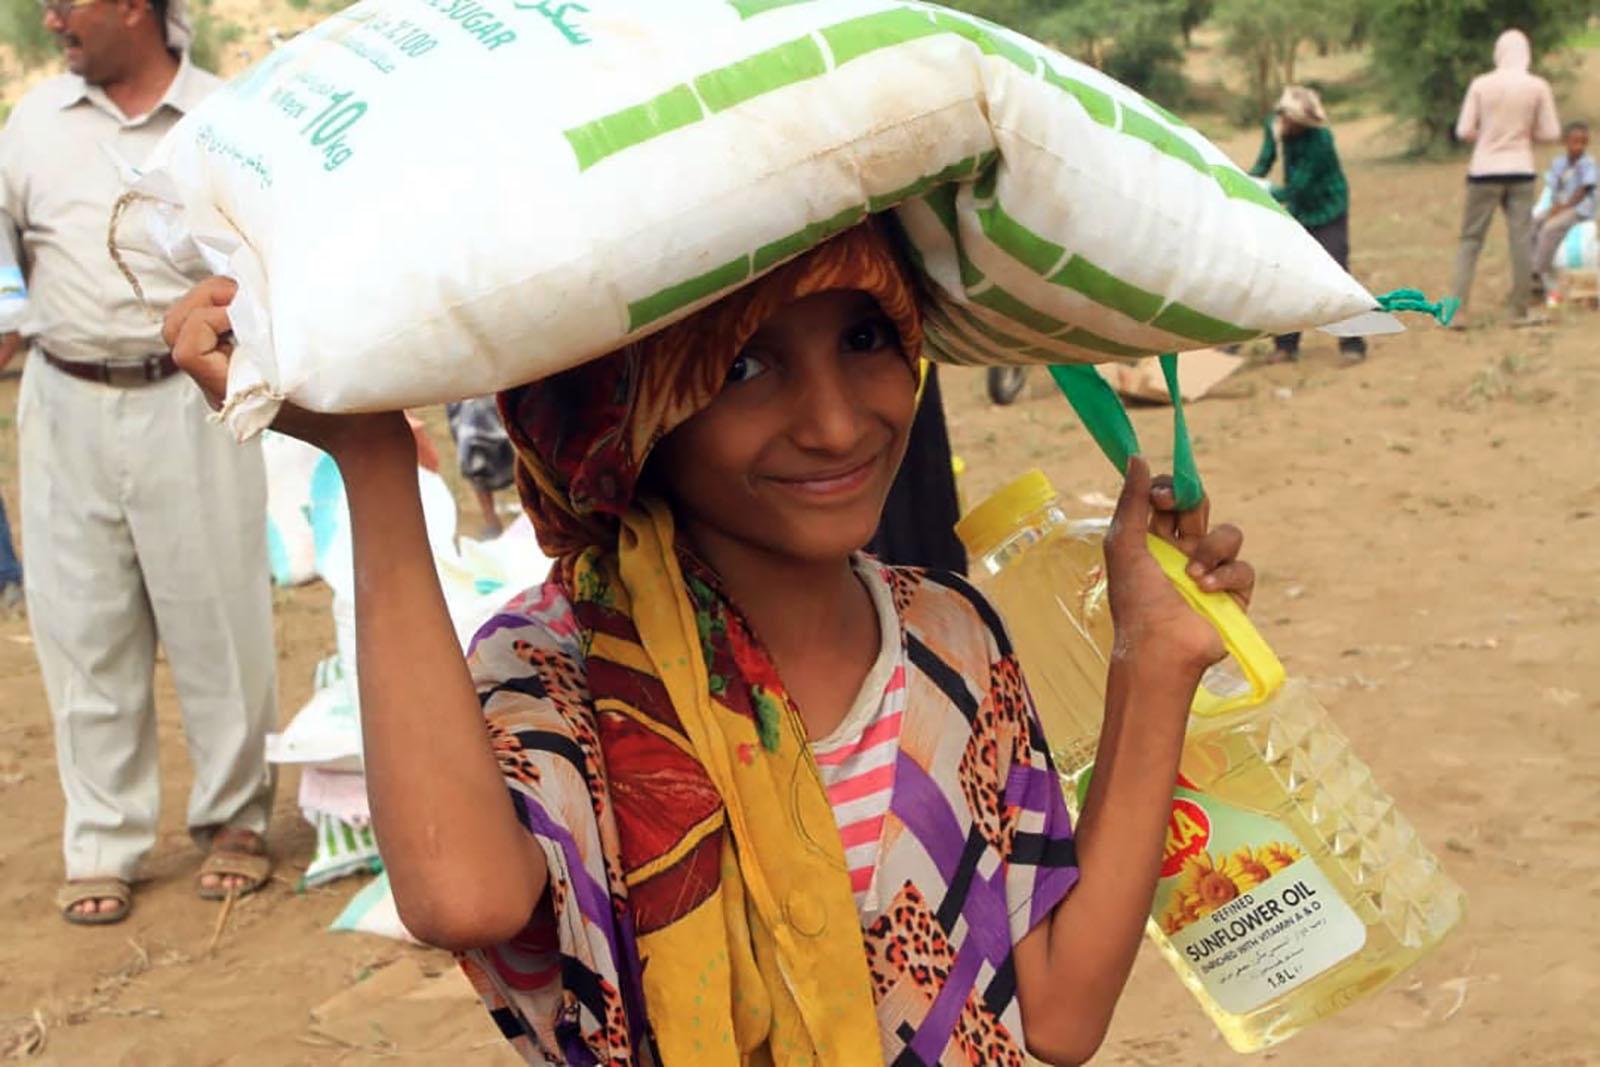 ihh-yemen-acil-yardim-kampanyasi-1.jpeg